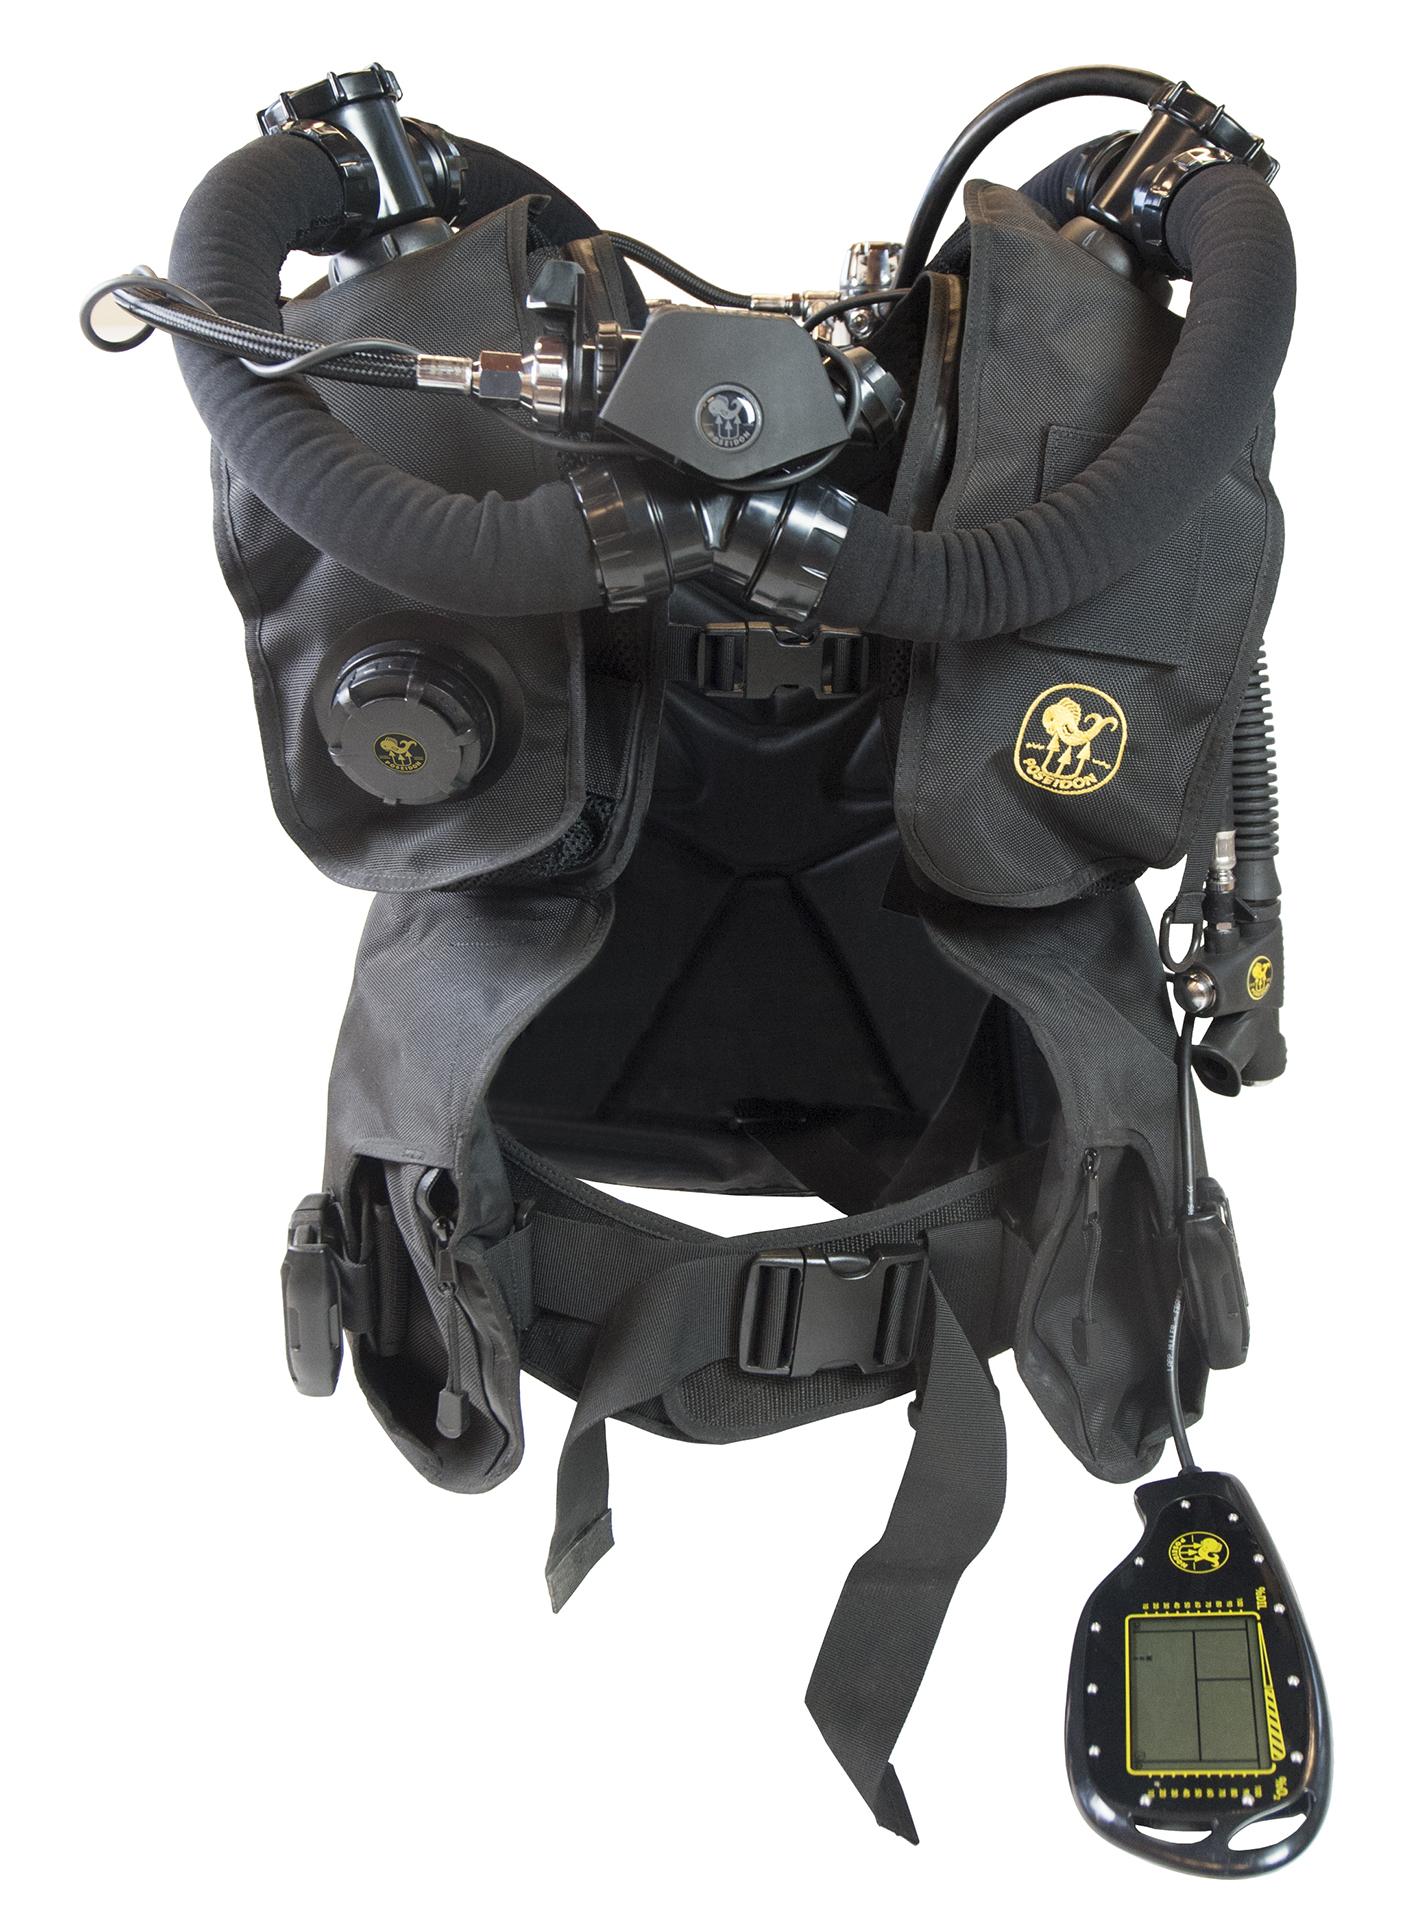 Rebreather Poseidon SE7EN - EU Rec edition